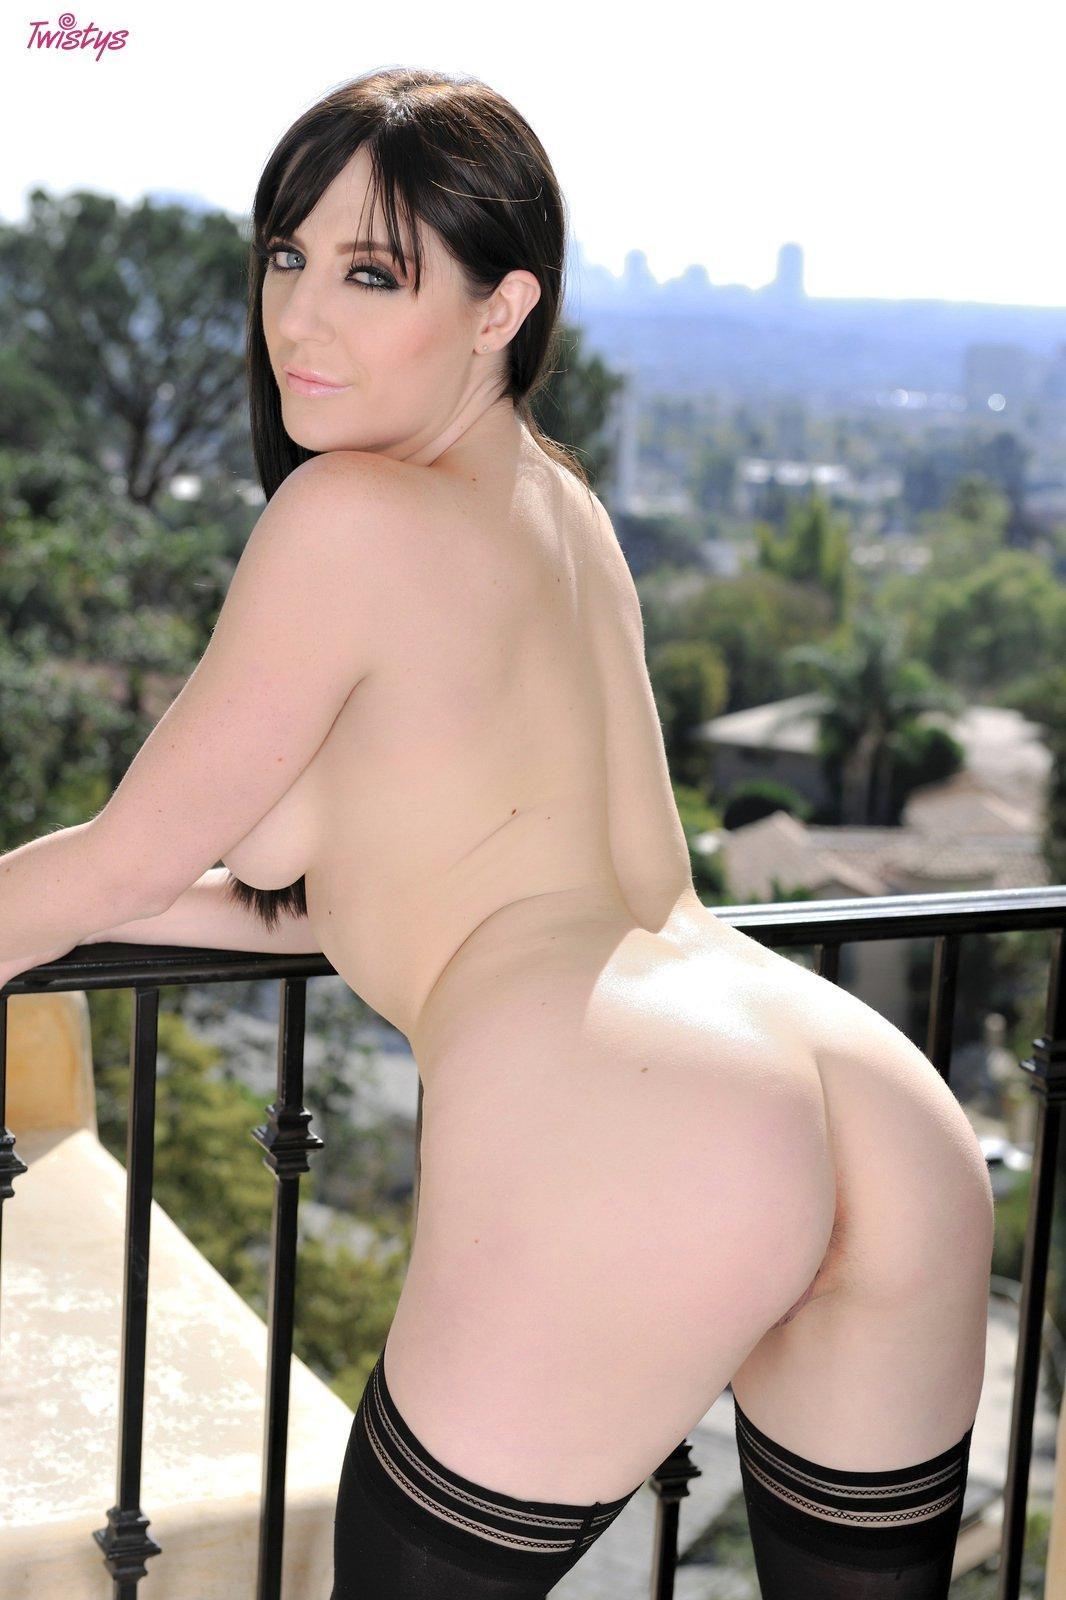 brazilian girls naked with big boobs